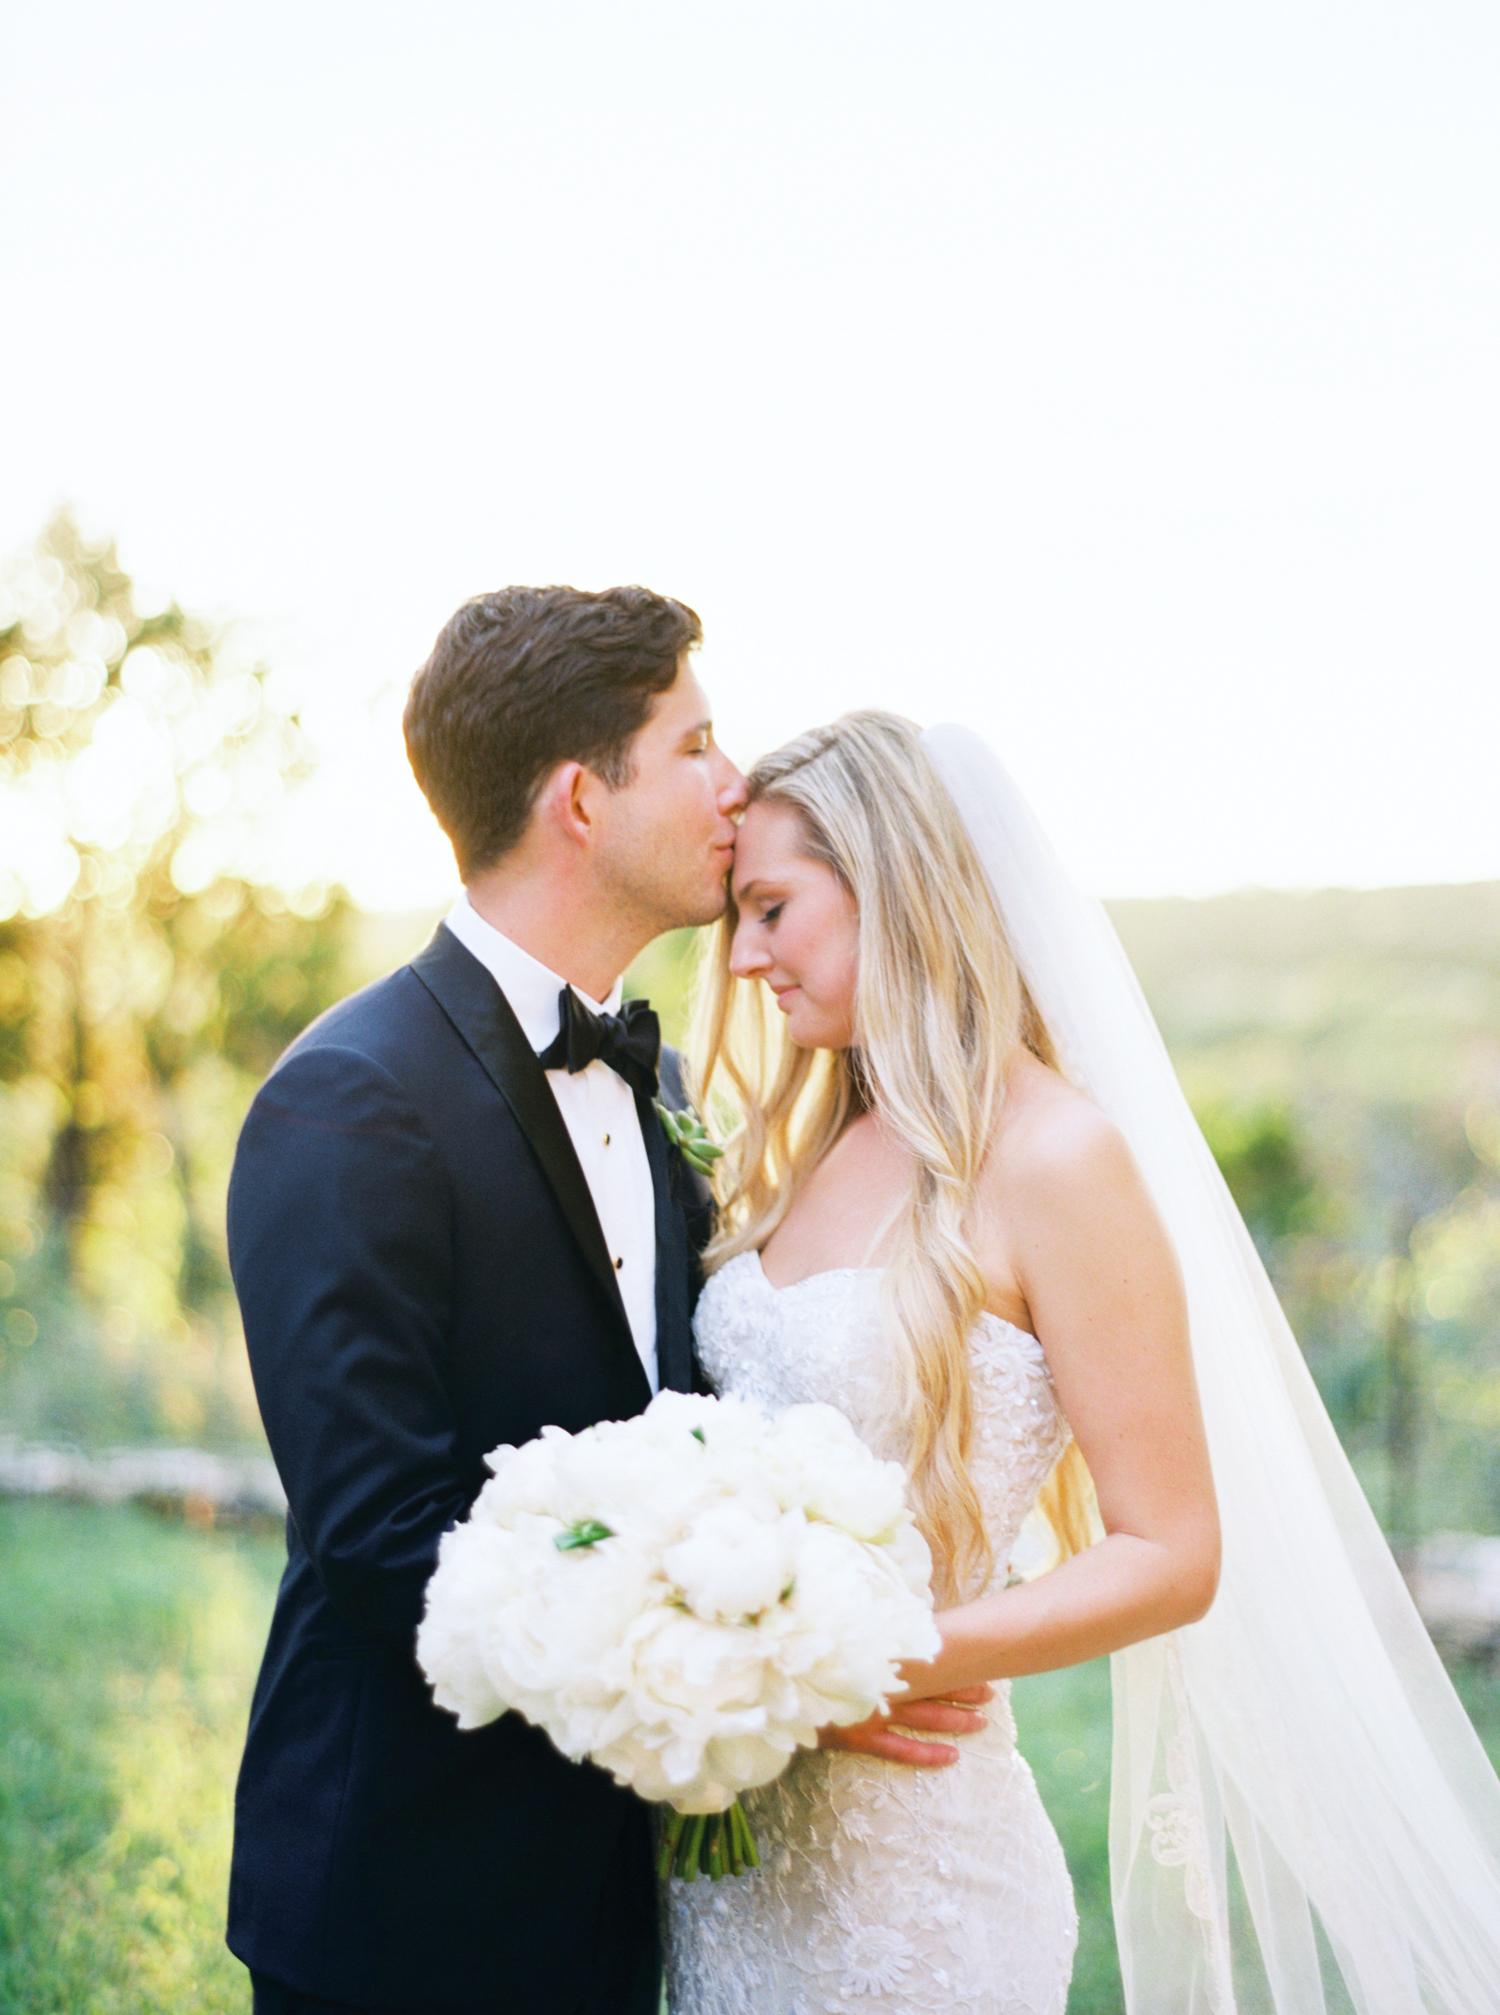 AUSTIN WEDDING PHOTOGRAPHER-67.jpg